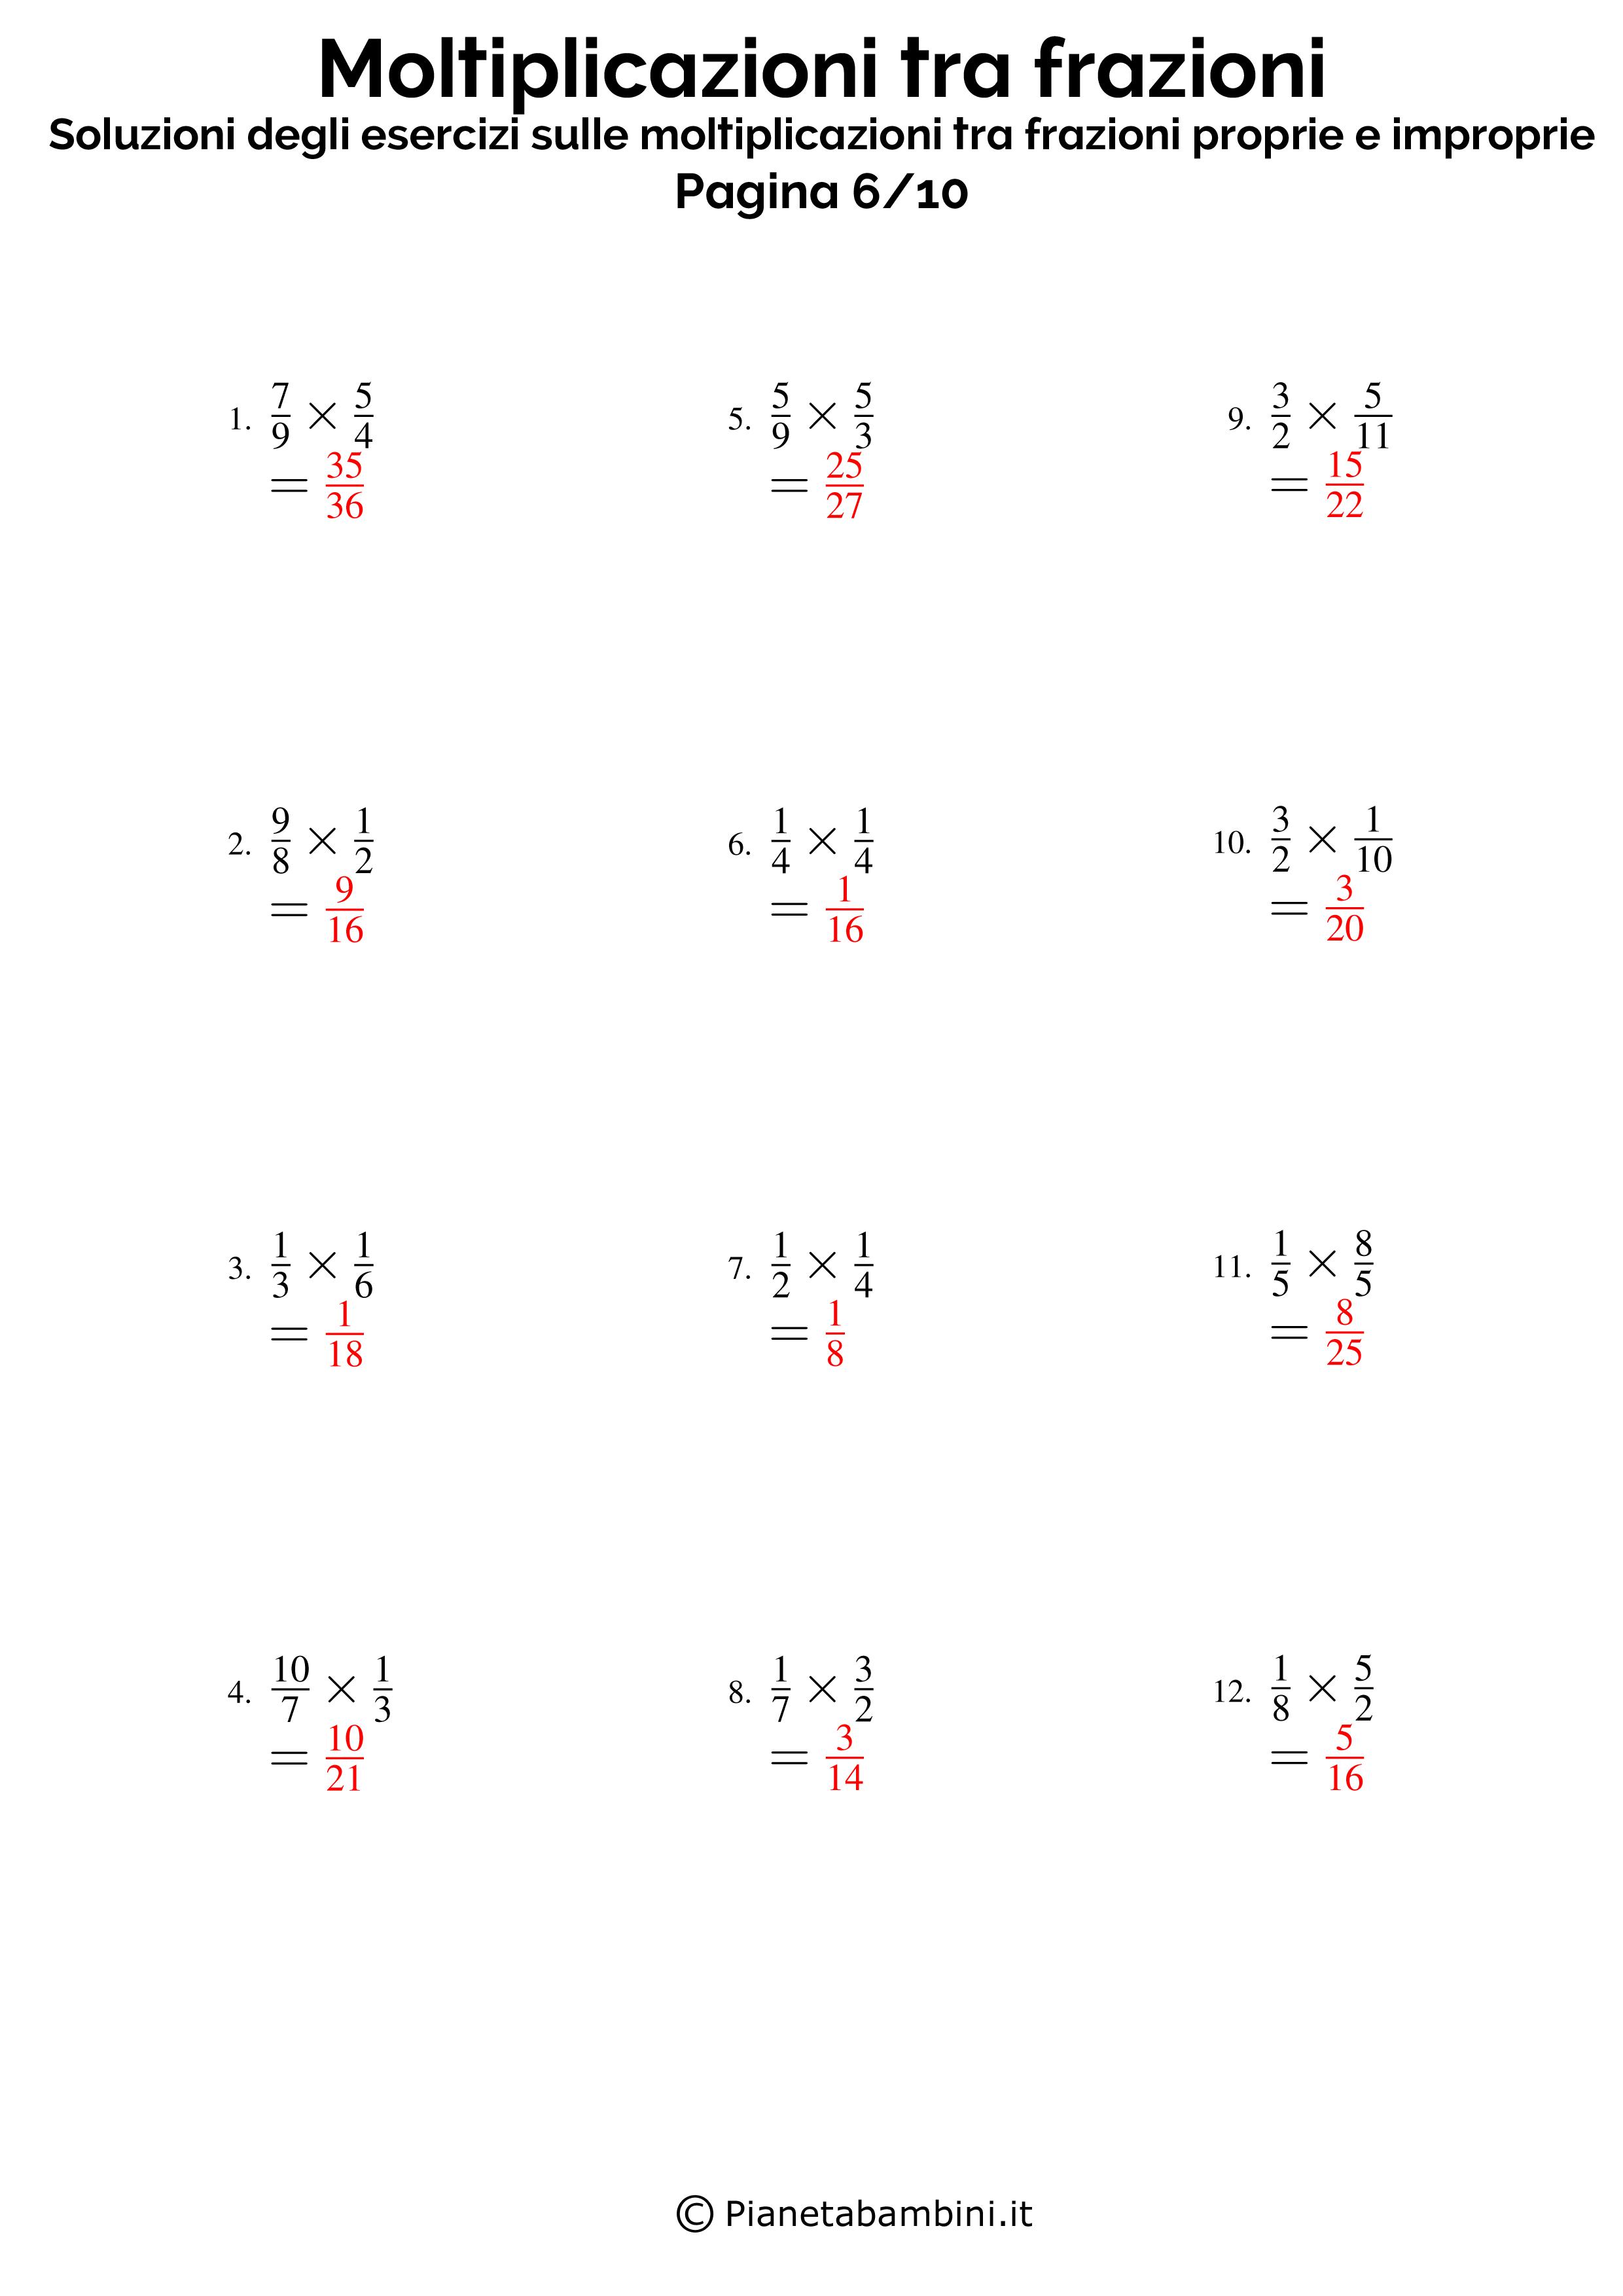 Soluzioni-Moltiplicazioni-Frazioni-Proprie-Improprie_06